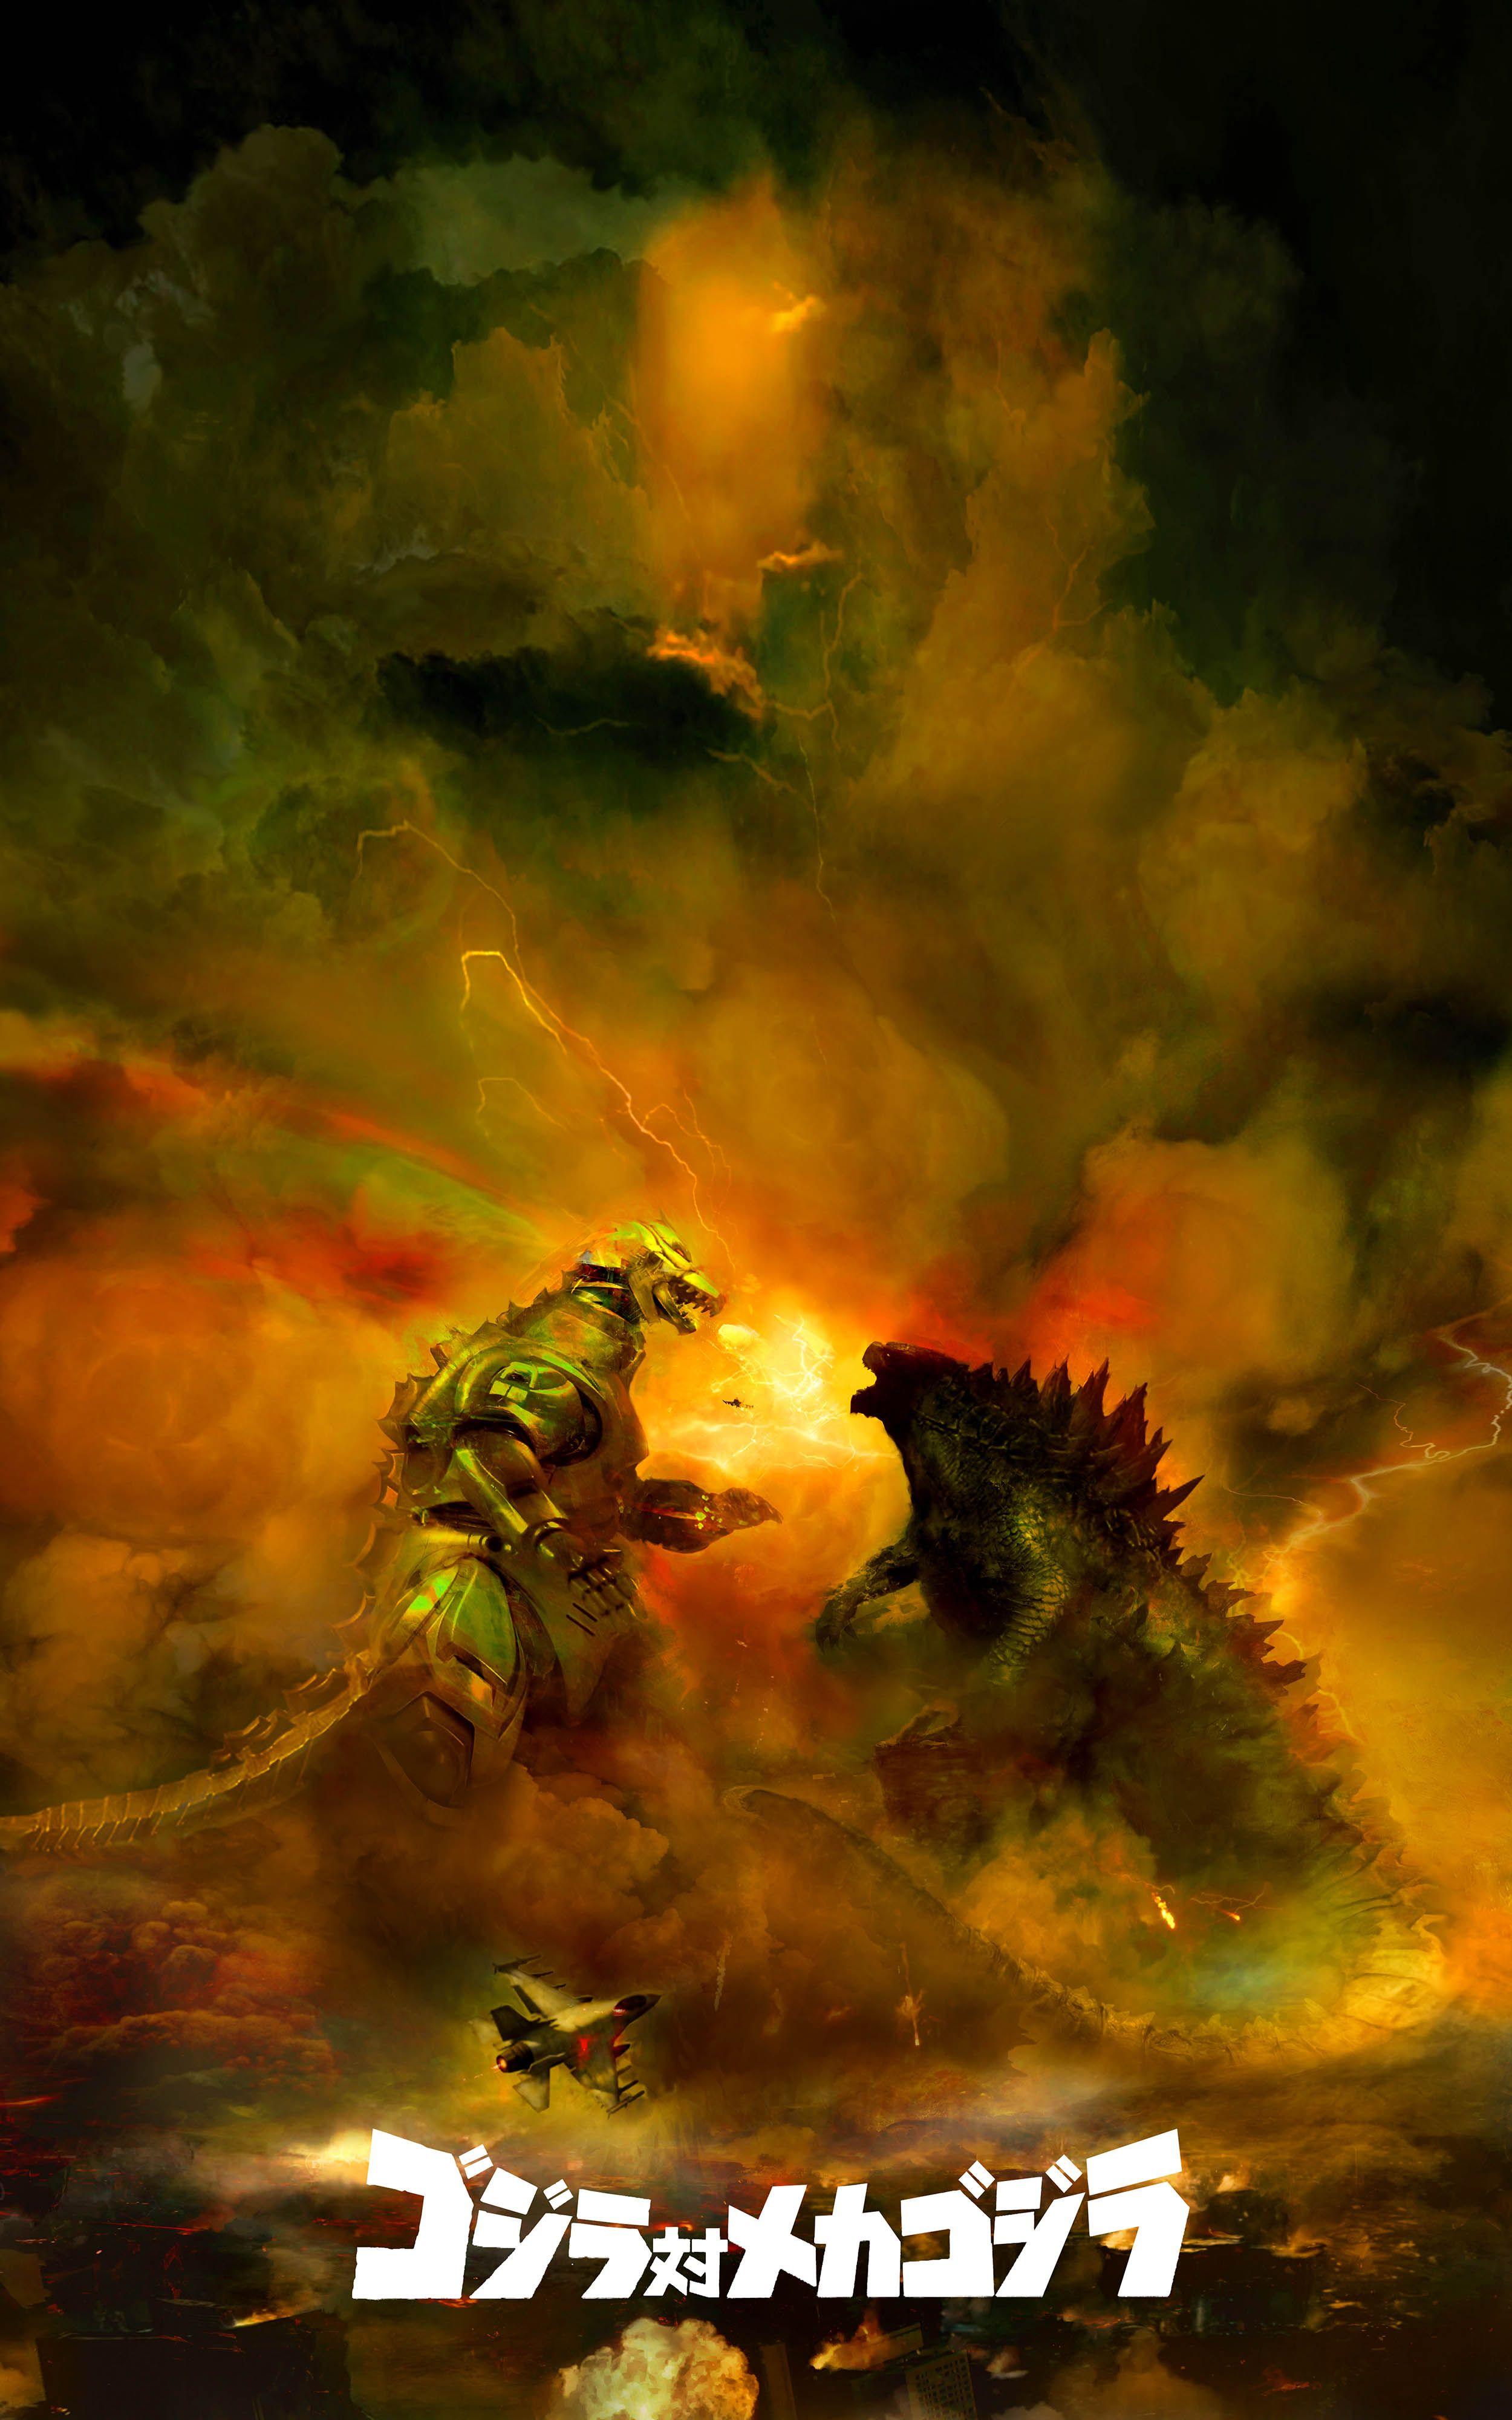 Godzilla vs mechagodzilla 24 x 36 godzilla godzilla